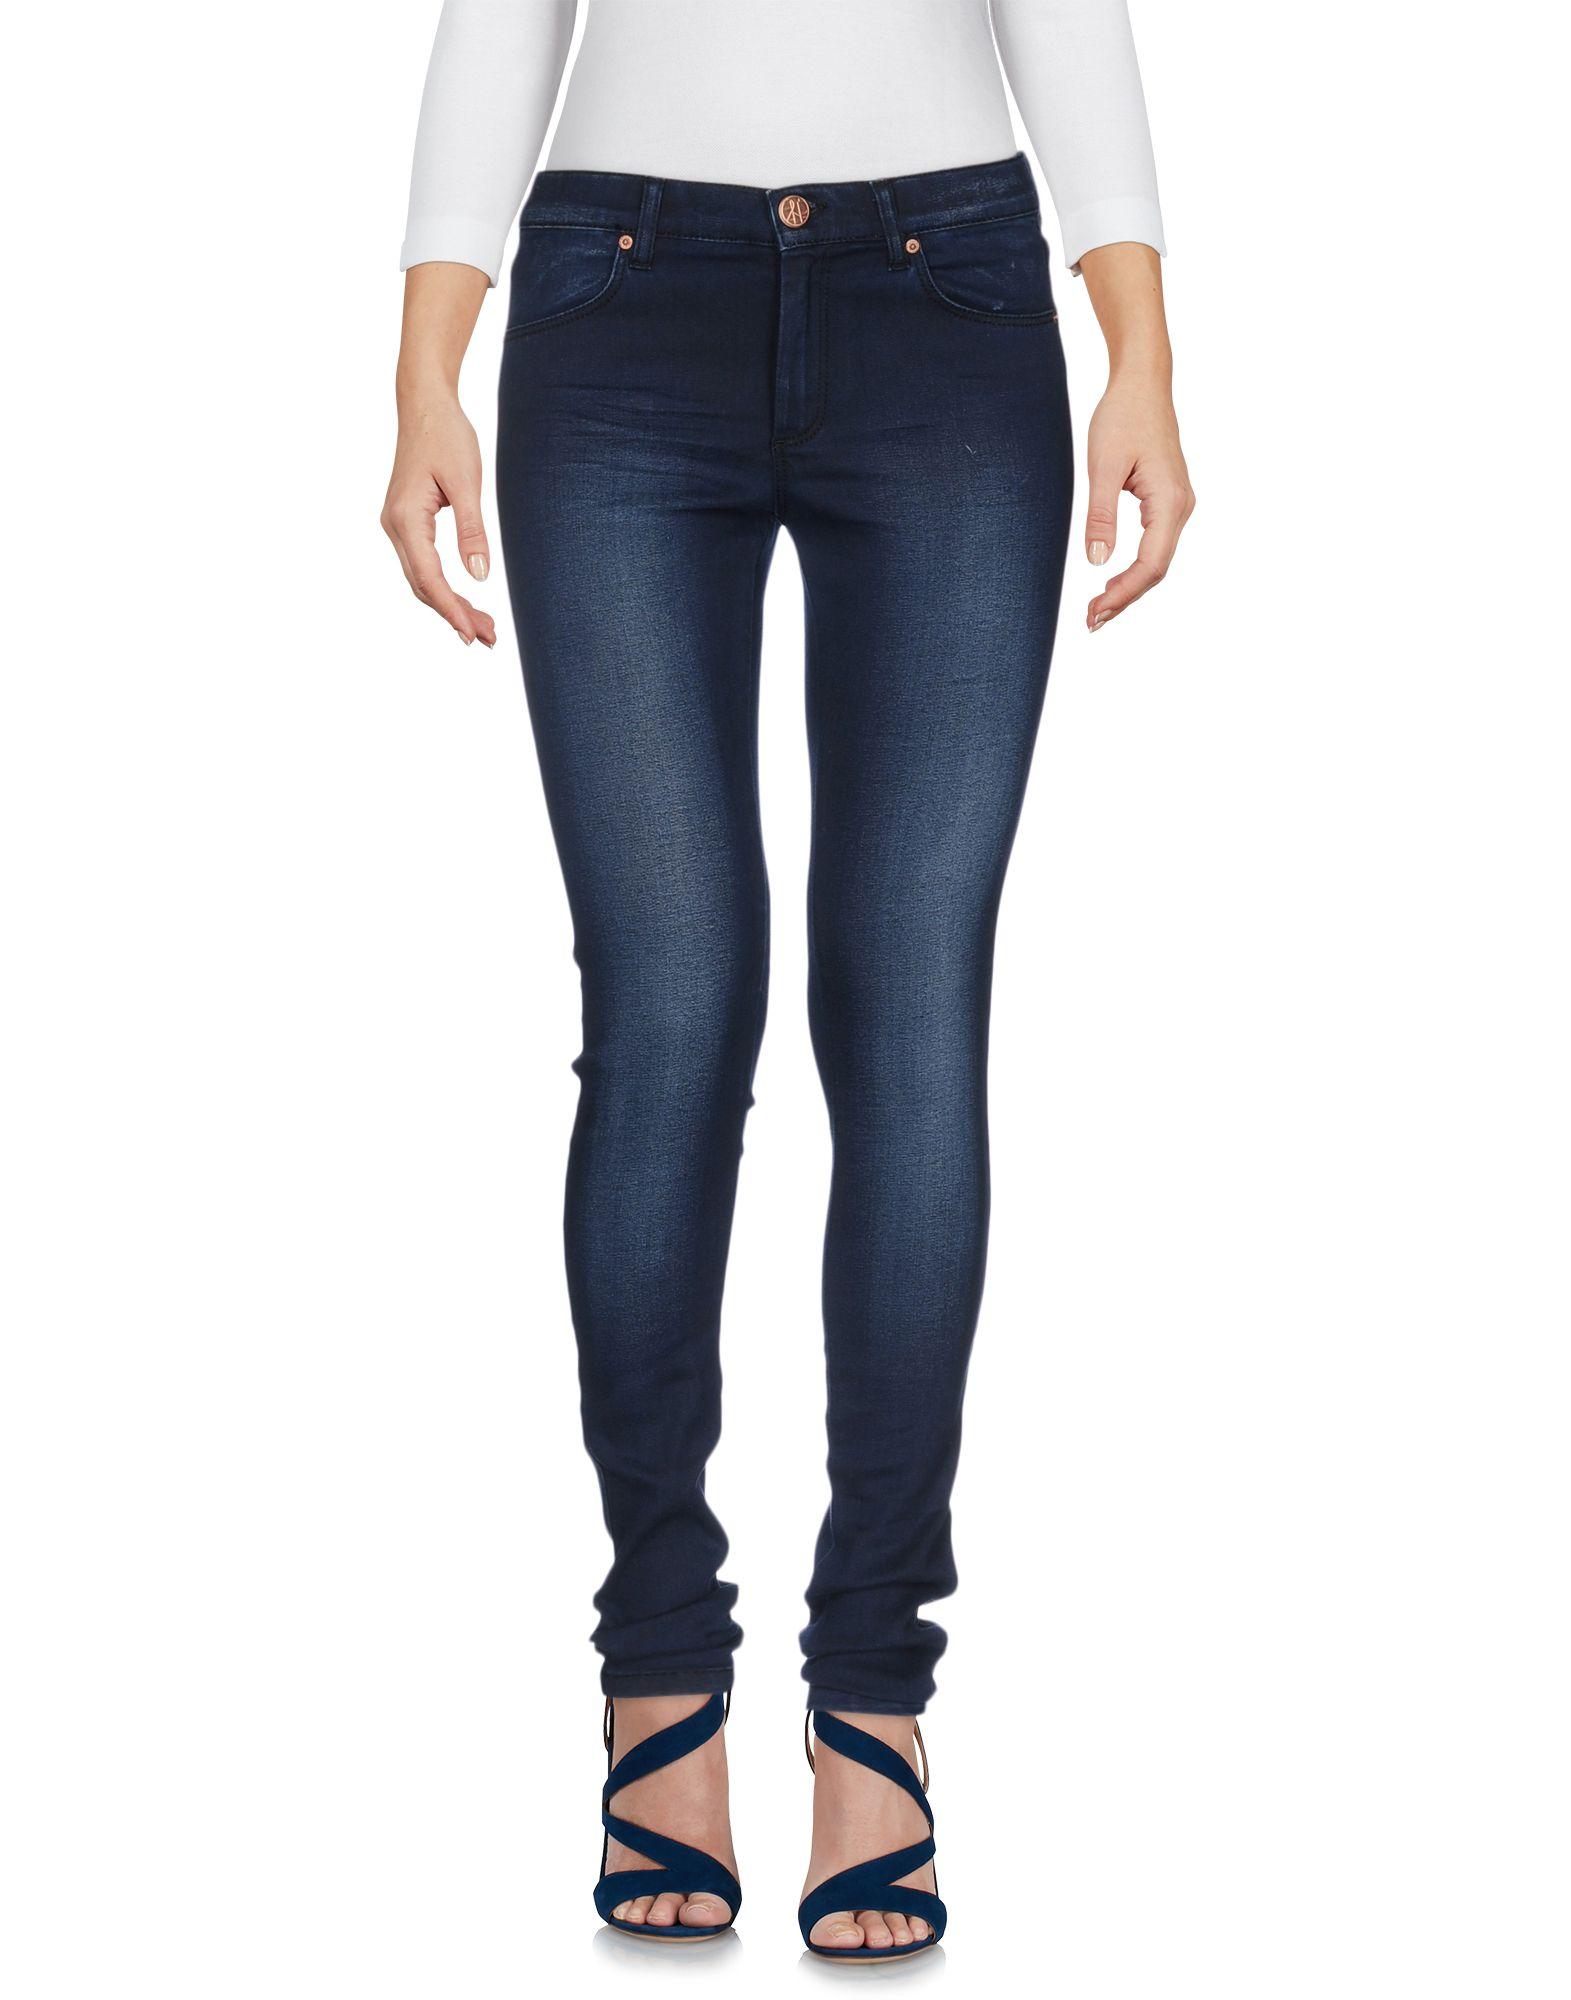 2ND ONE Damen Jeanshose Farbe Blau Größe 3